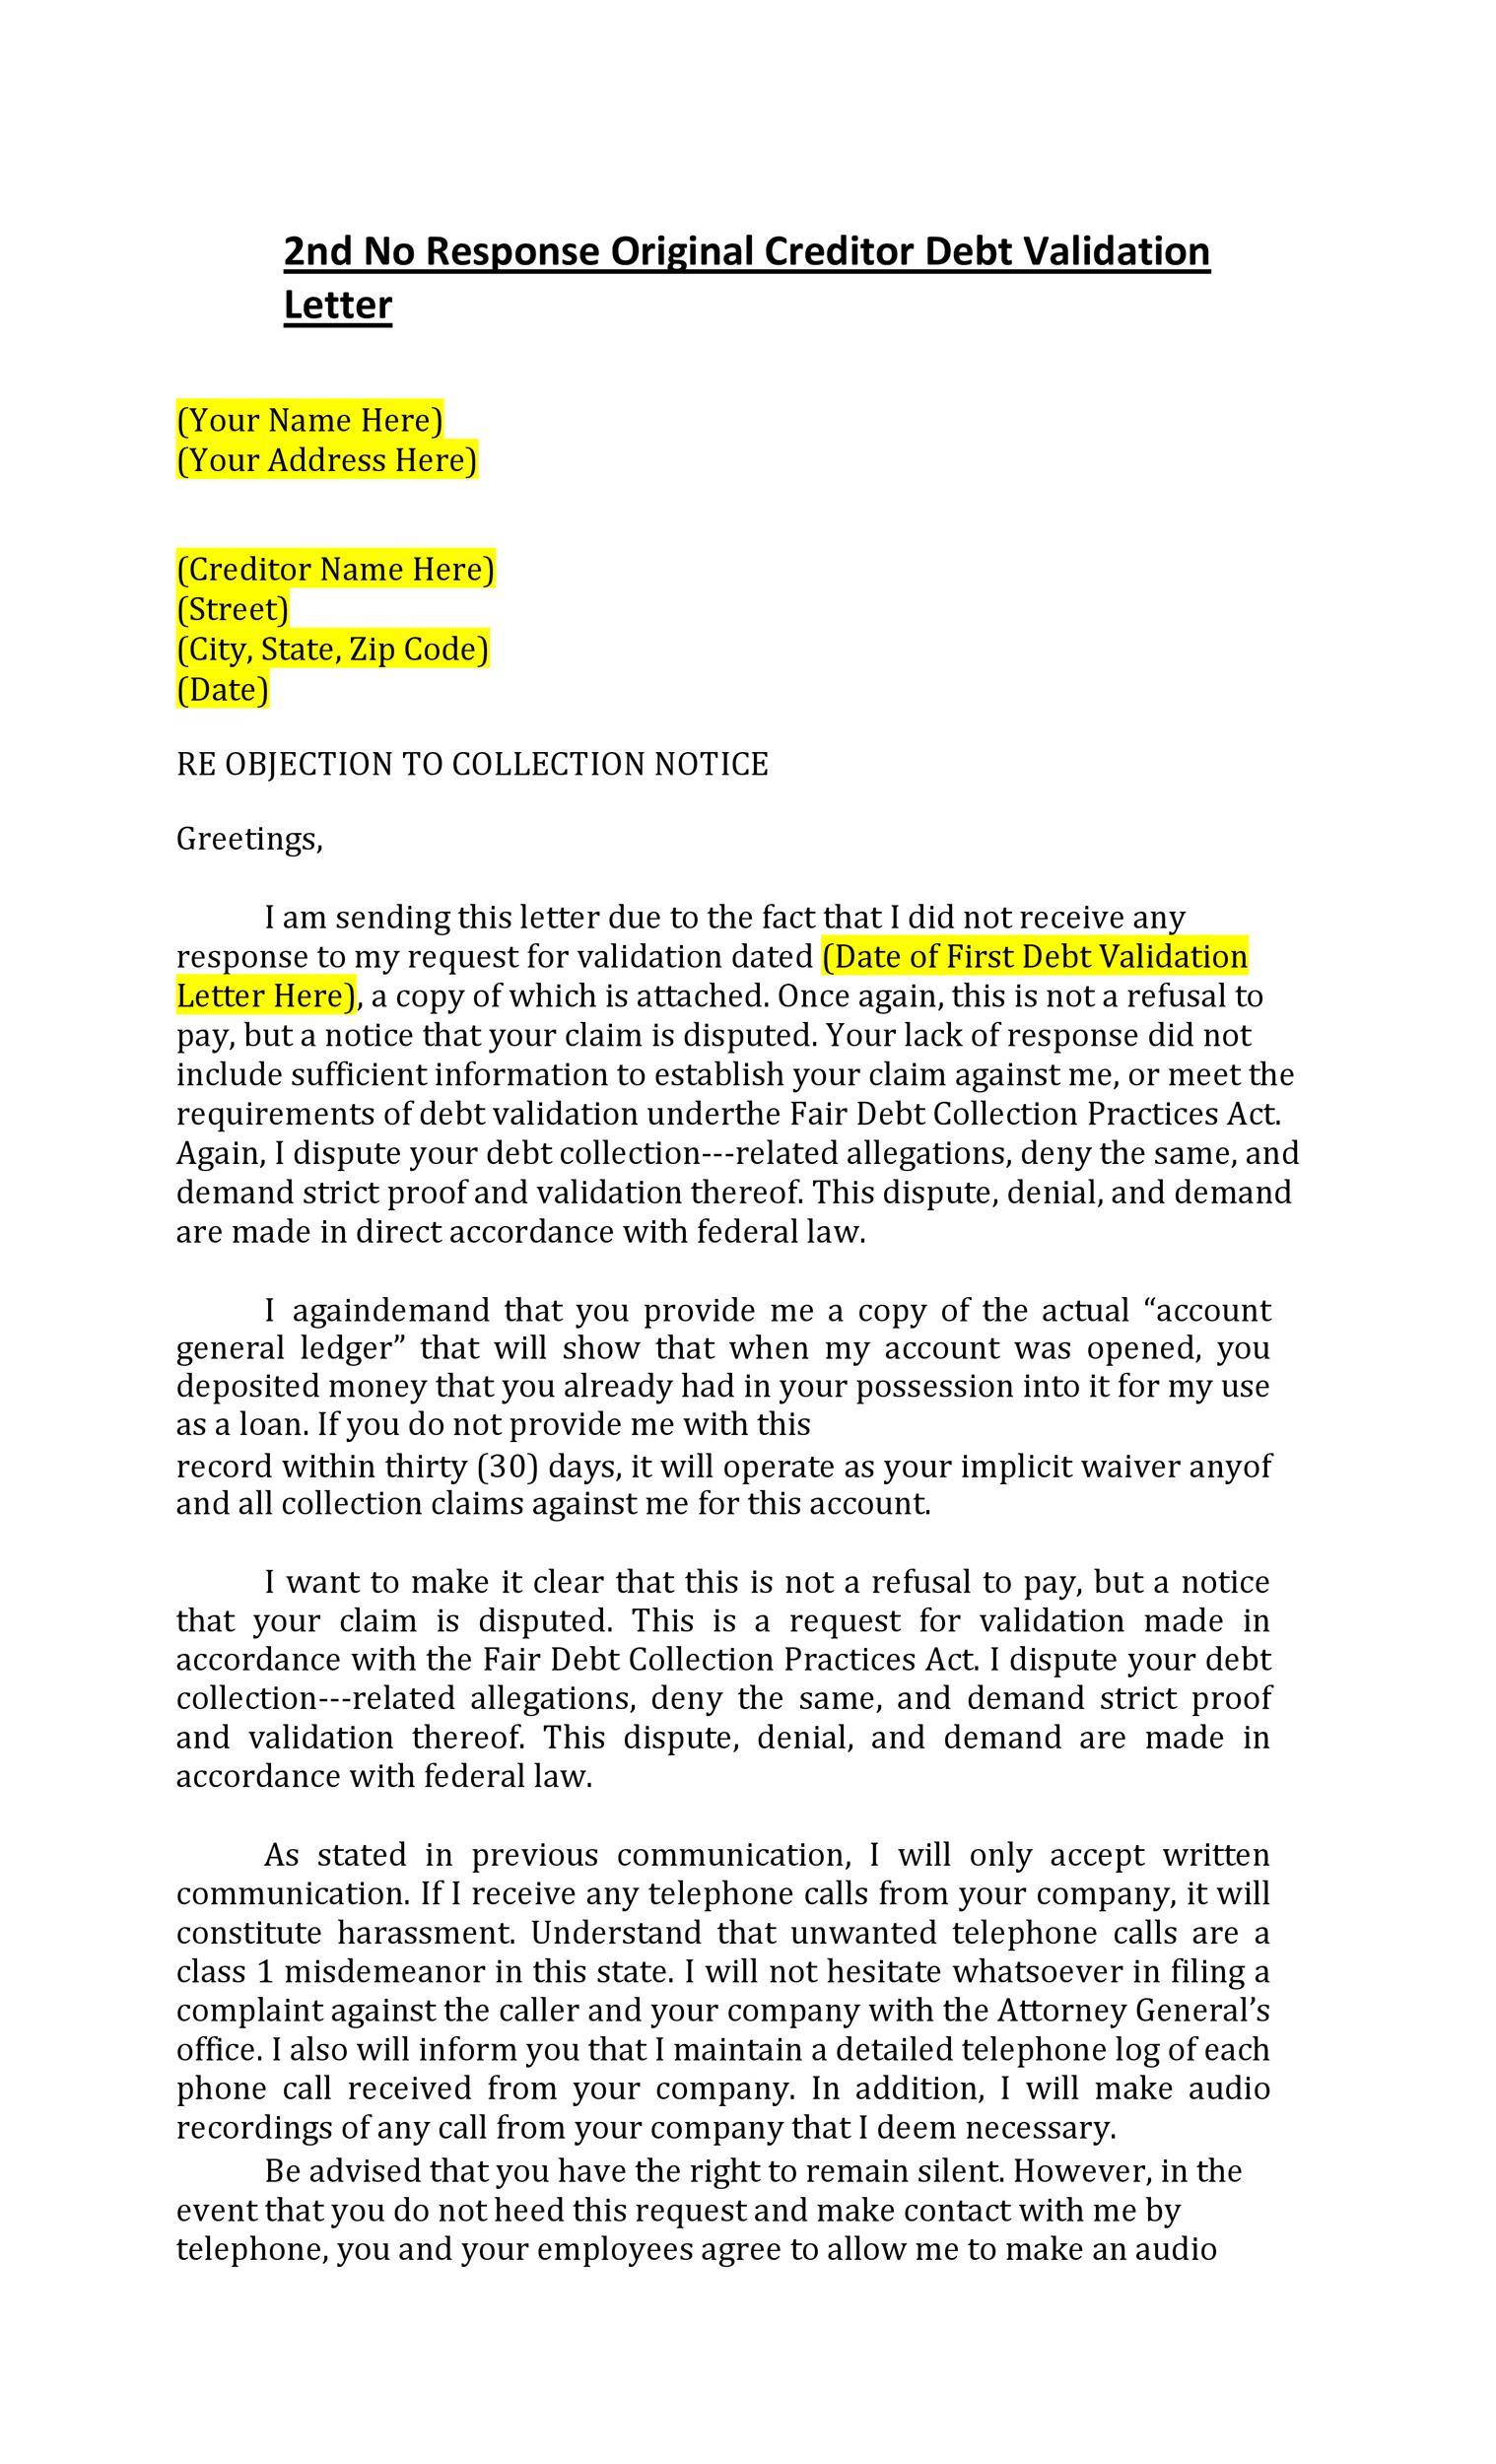 Free debt validation letter 09